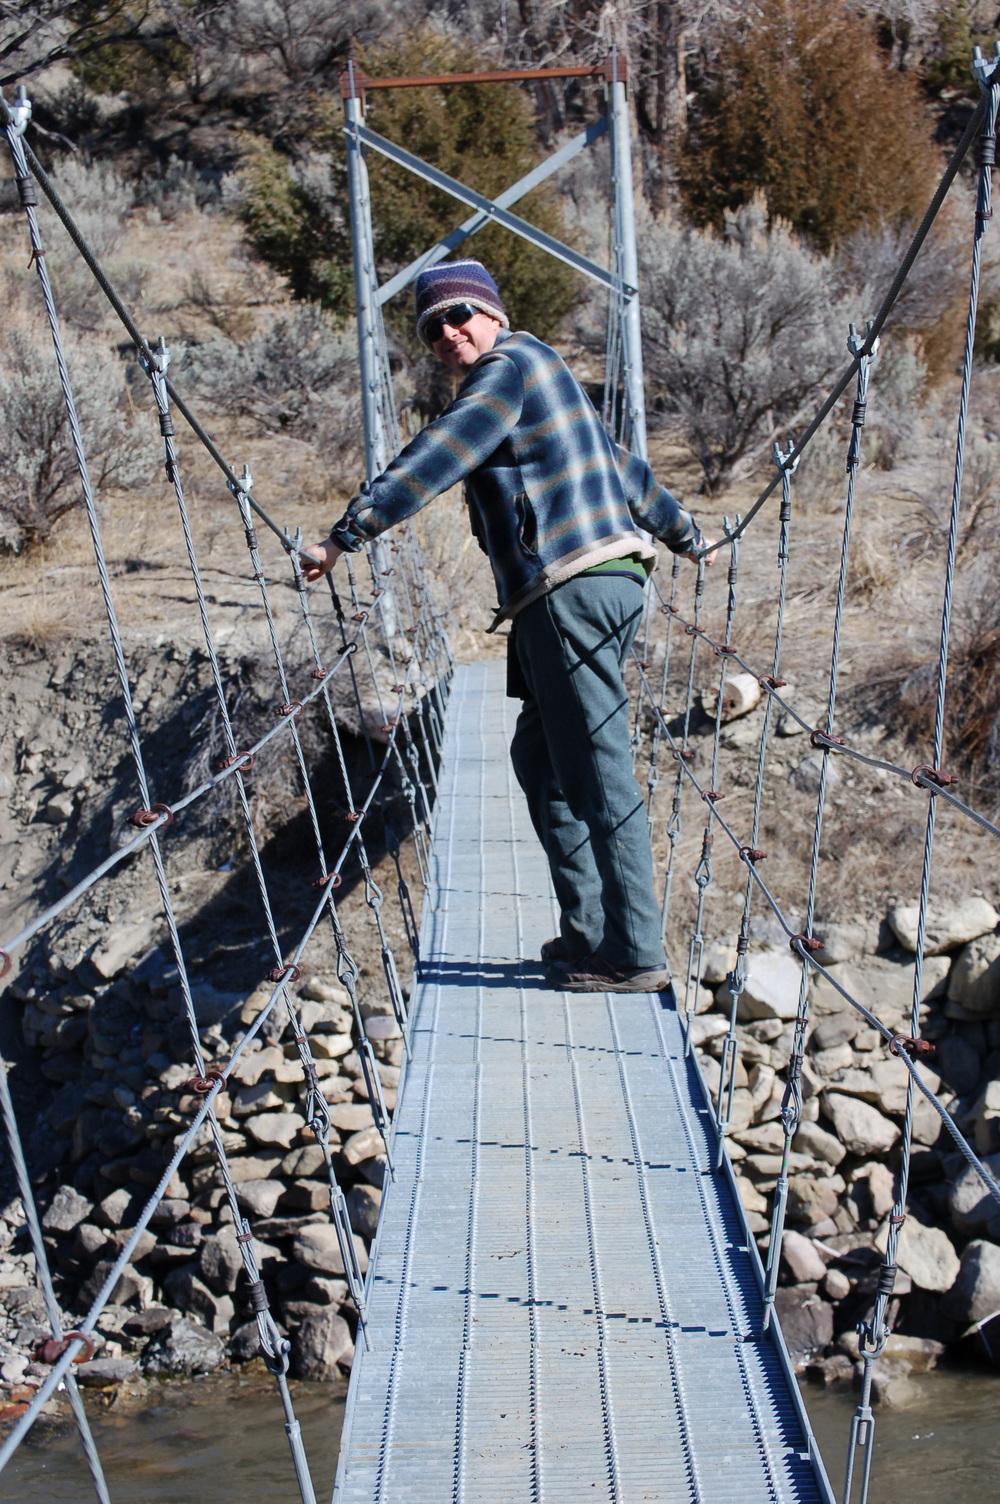 Suspended over the Gardner River